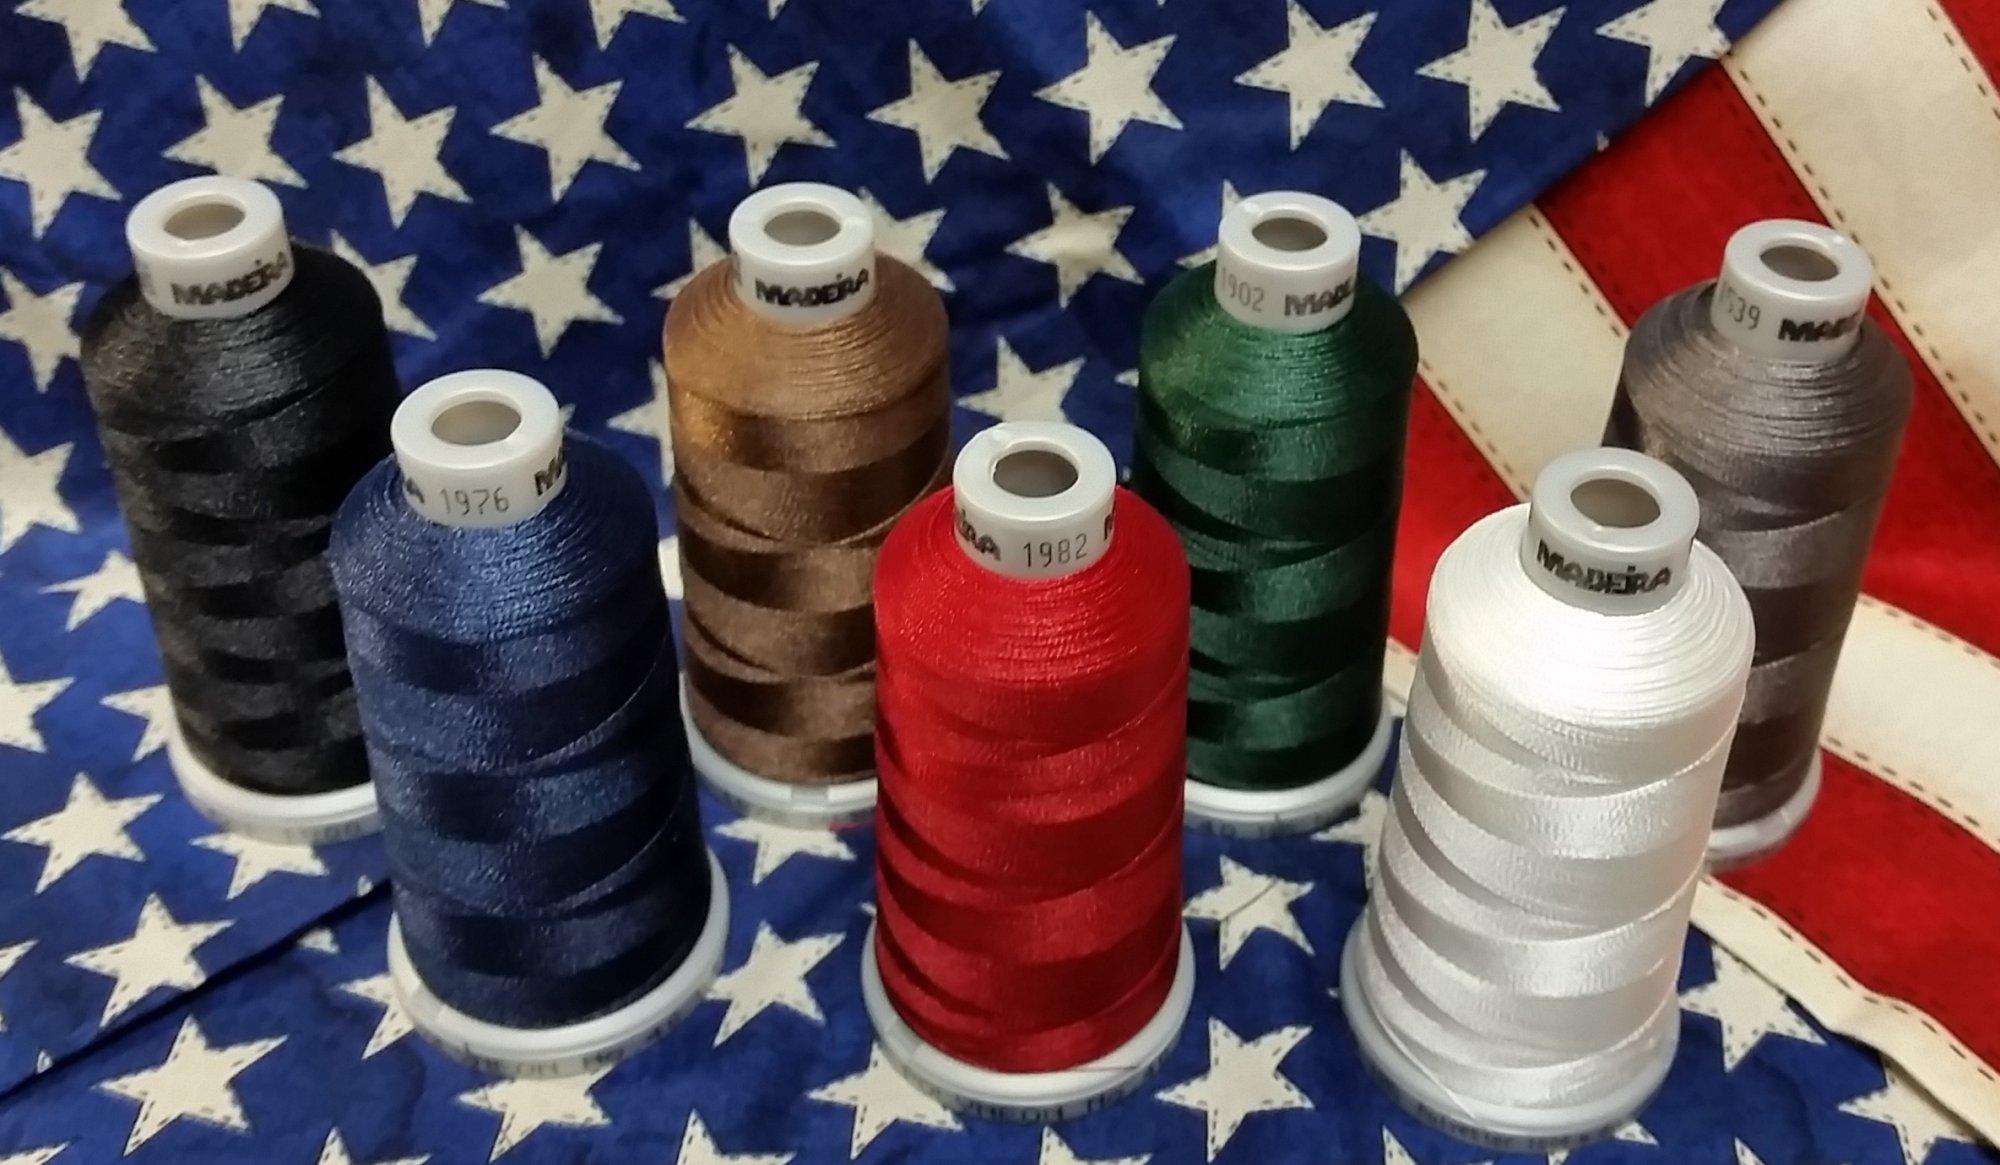 American Honor Applique Thread Kit